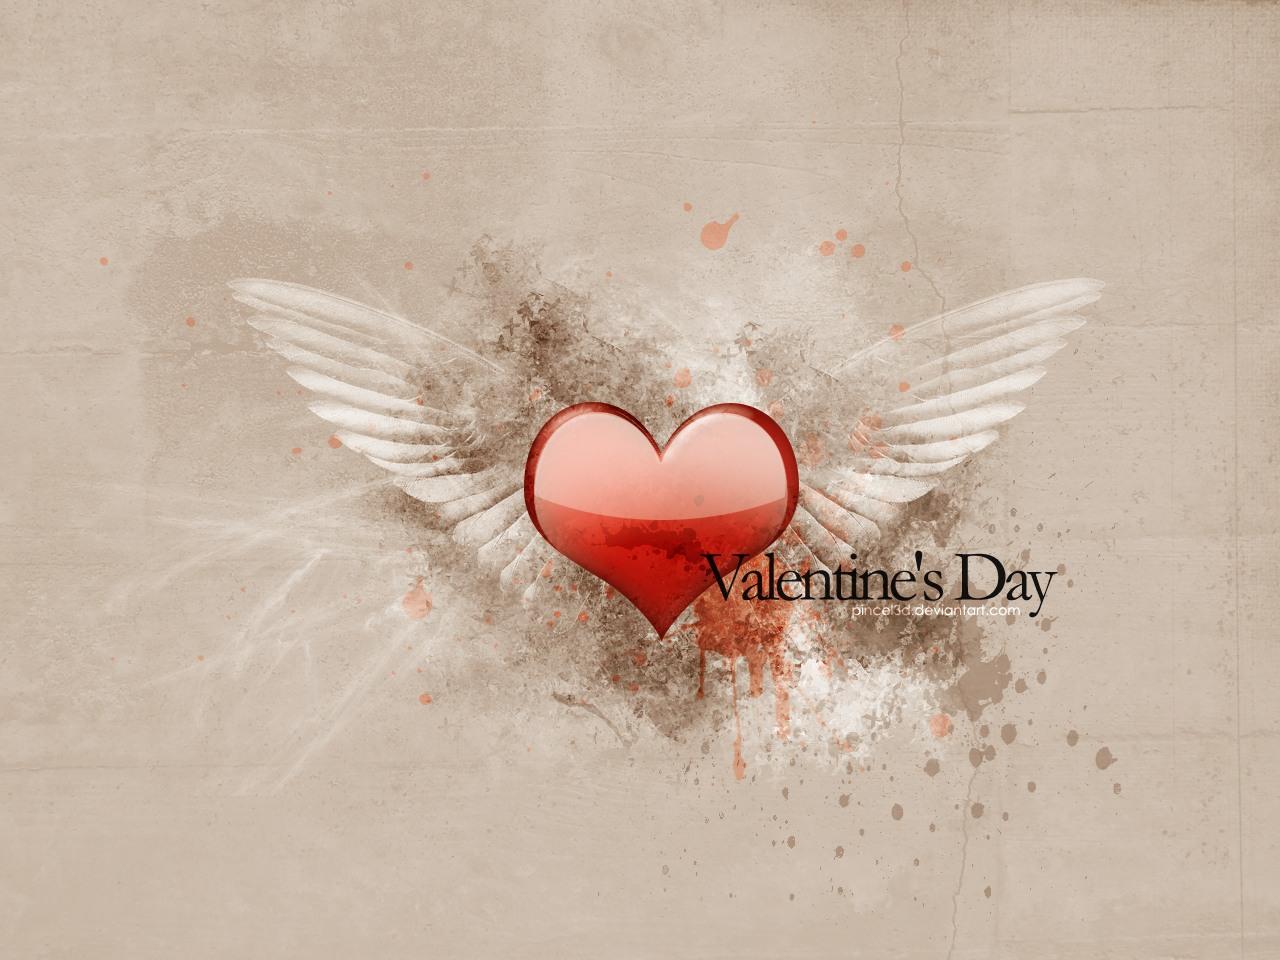 http://3.bp.blogspot.com/-xYDUlqbnn4I/UPwWfdfjdkI/AAAAAAAABDI/4nIcVpE1cdM/s1600/valentine%27s+day+wallpaper-nacozinhacomamalves.blogspot.com-valentine-day-wallpaper.jpg